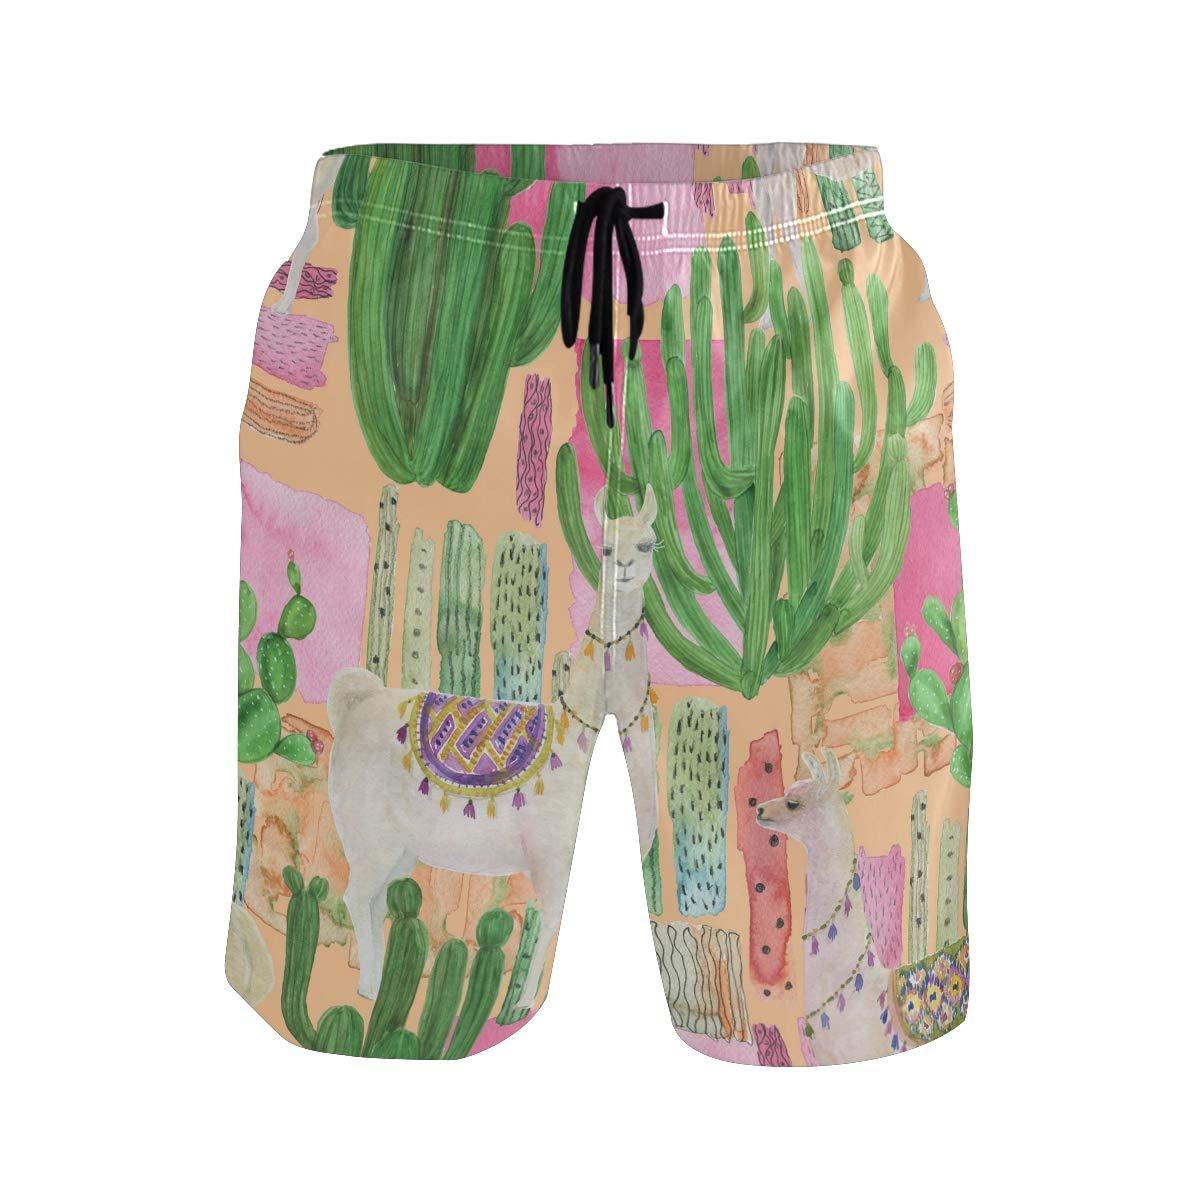 AUUXVA Mens Swim Trunks Animal Llama Alpaca Cactus Quick Dry Beach Shorts Summer Surf Board Shorts